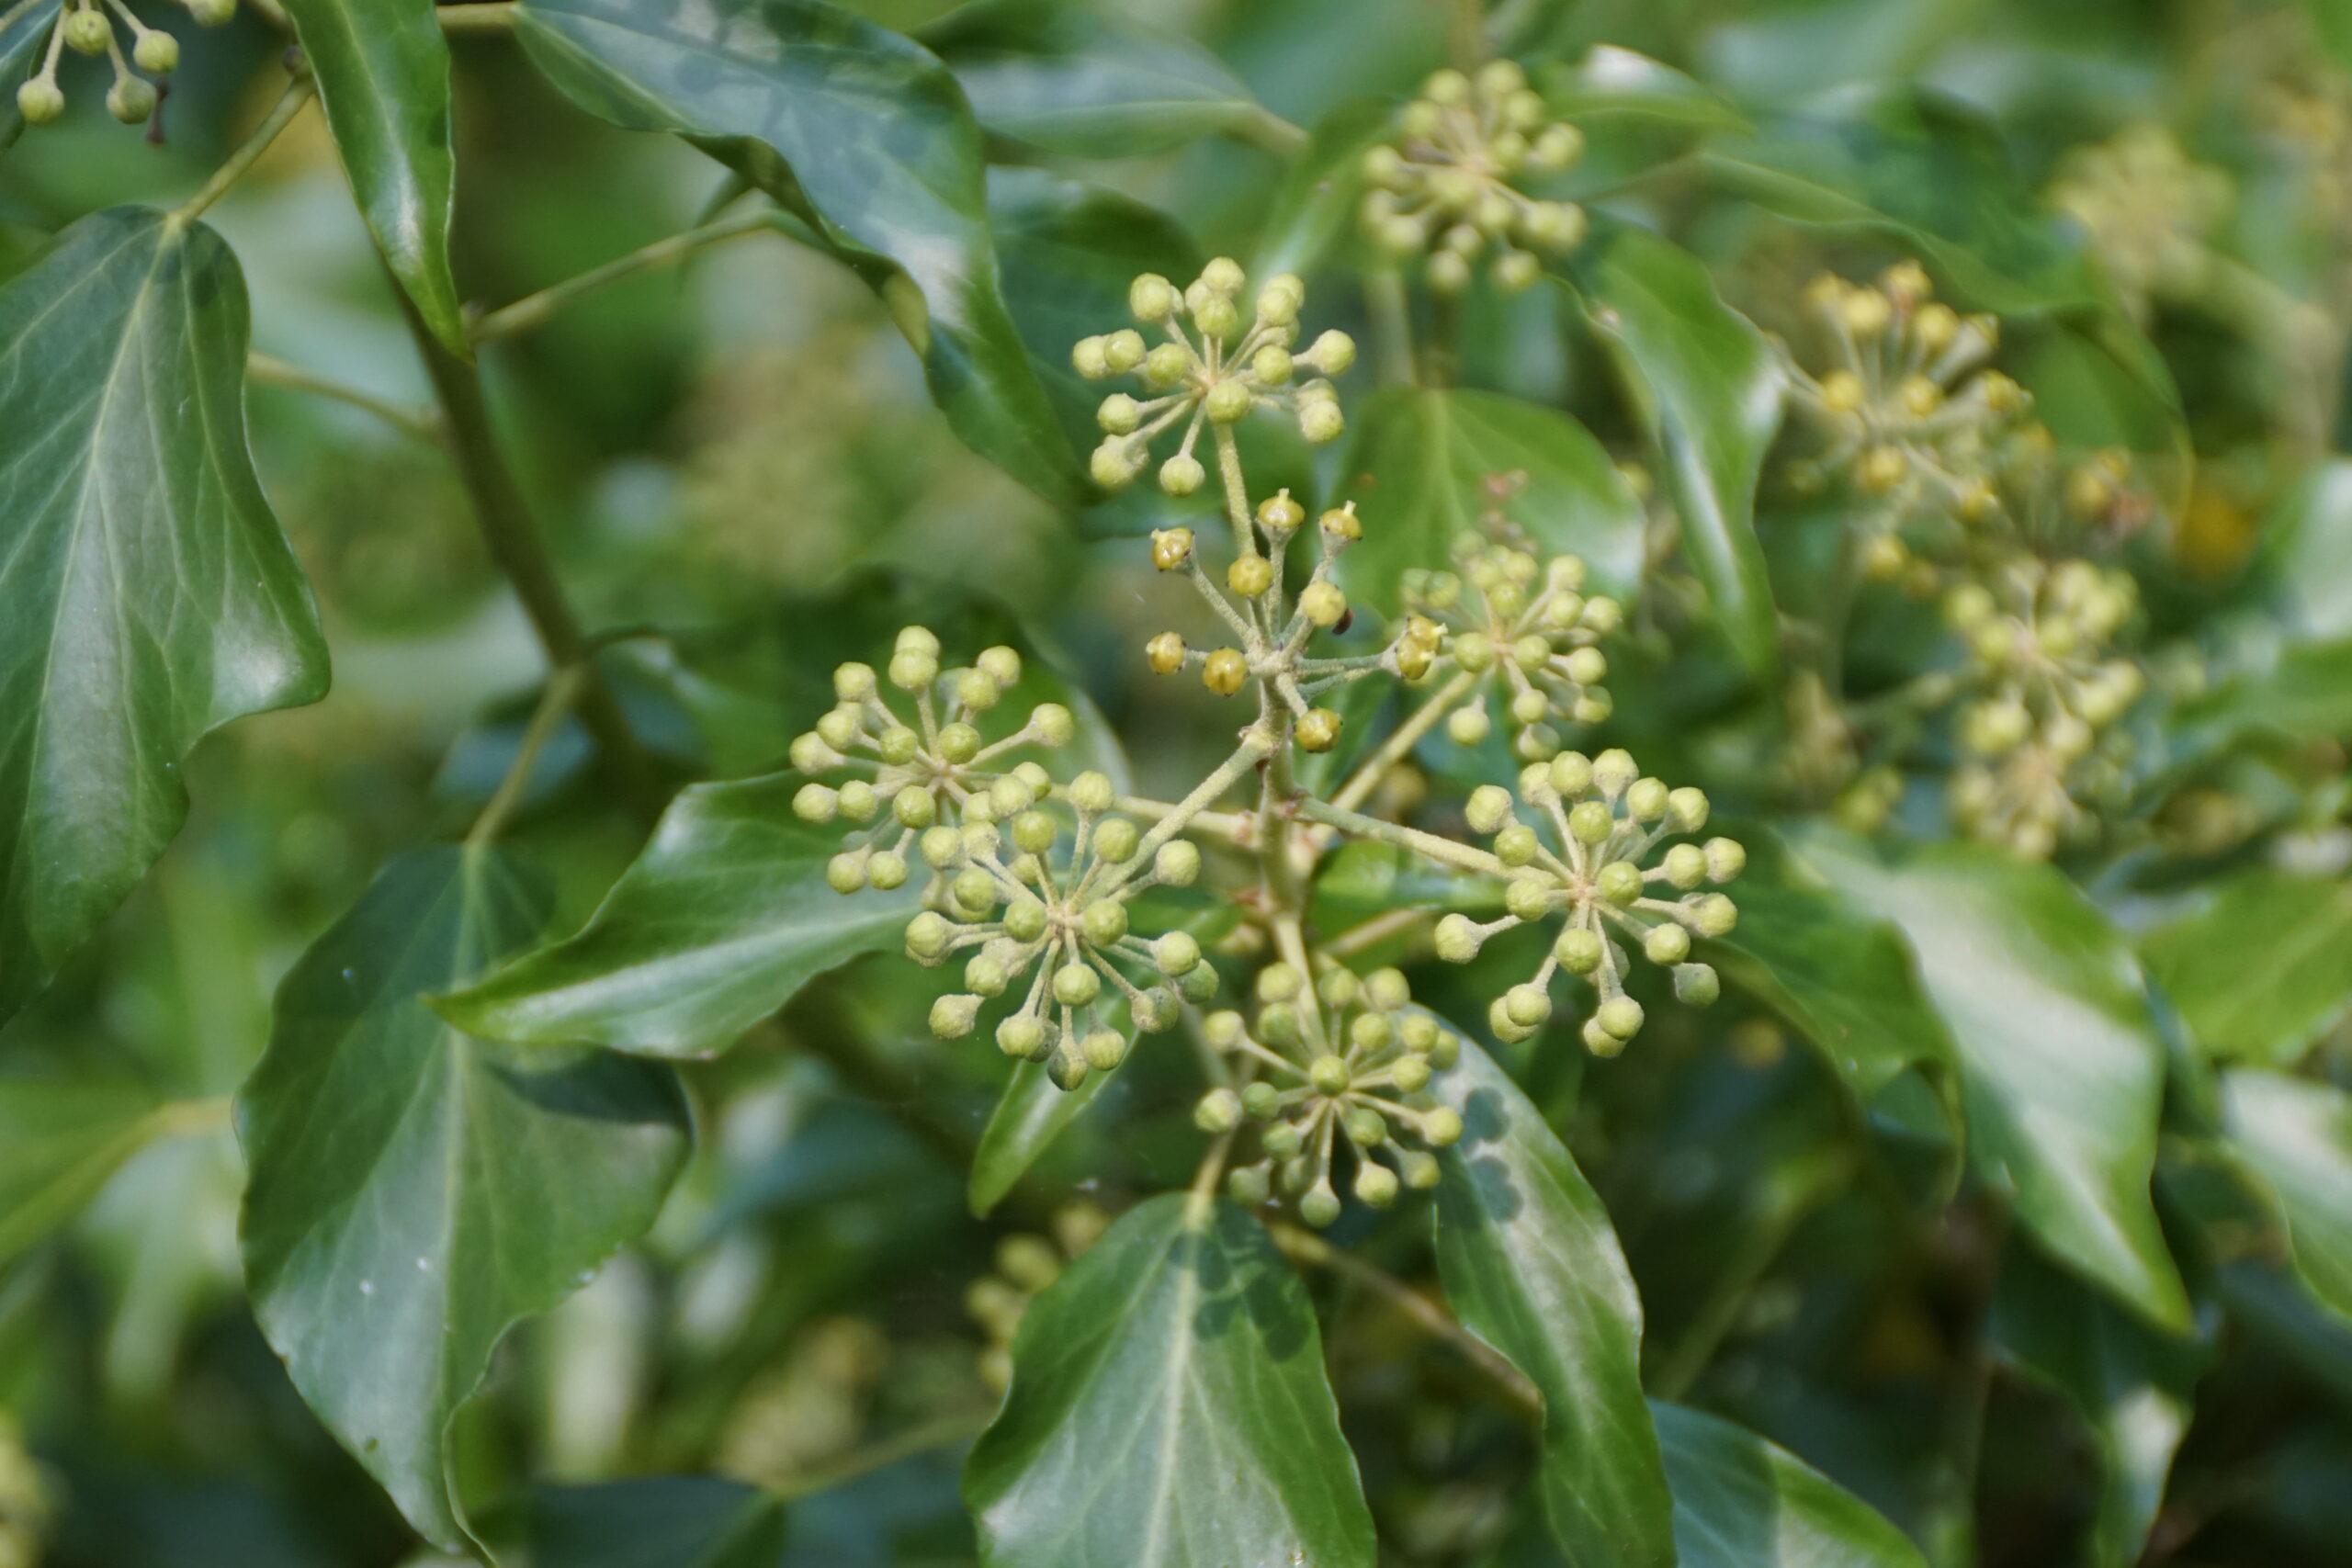 Flowers on Ivy - September